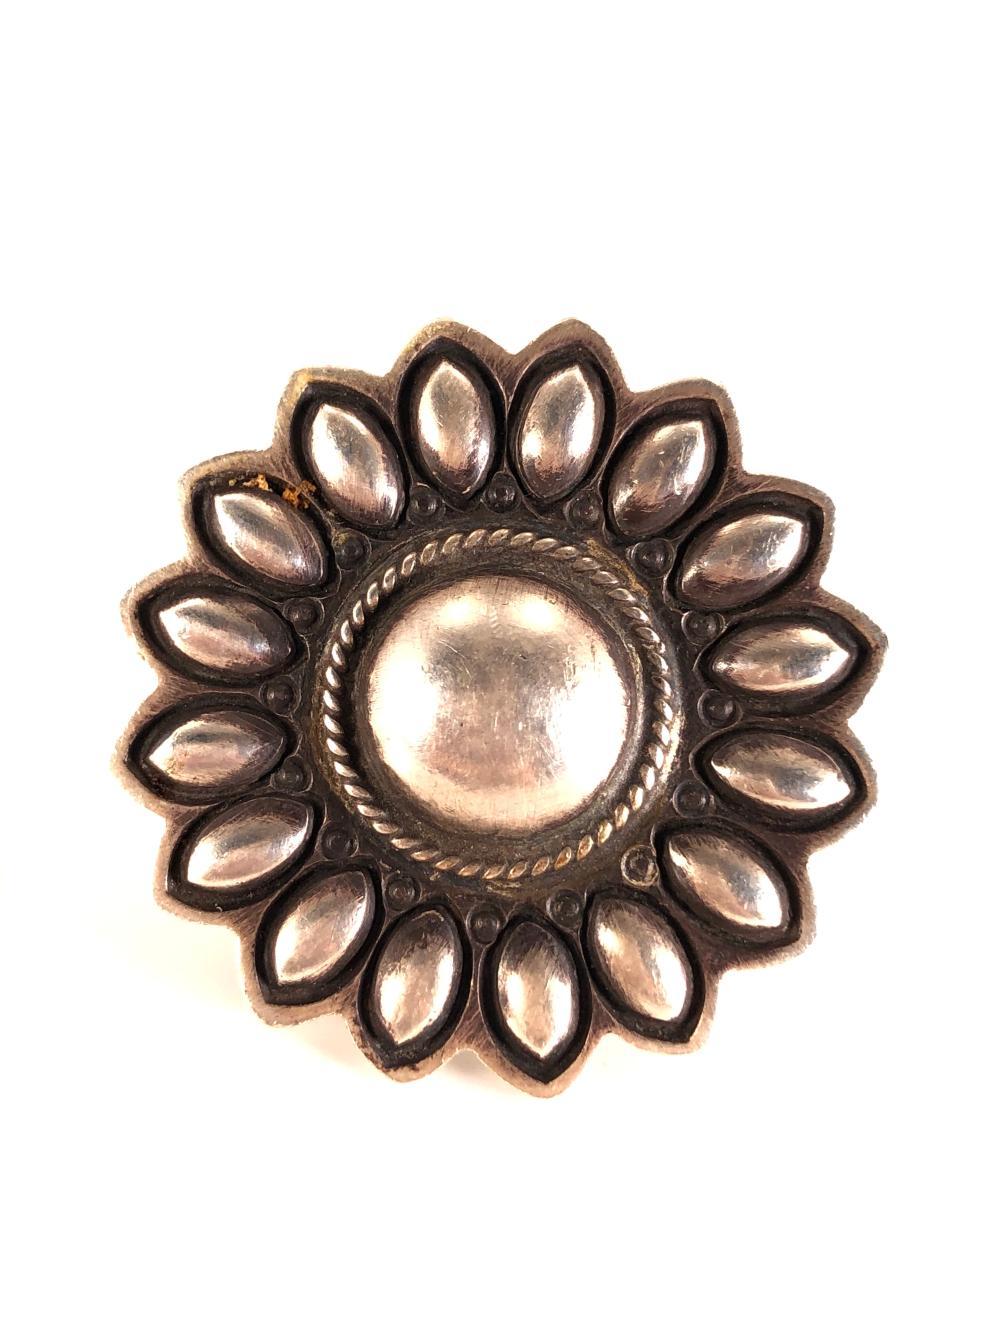 Native American Navajo Sterling Silver Ring